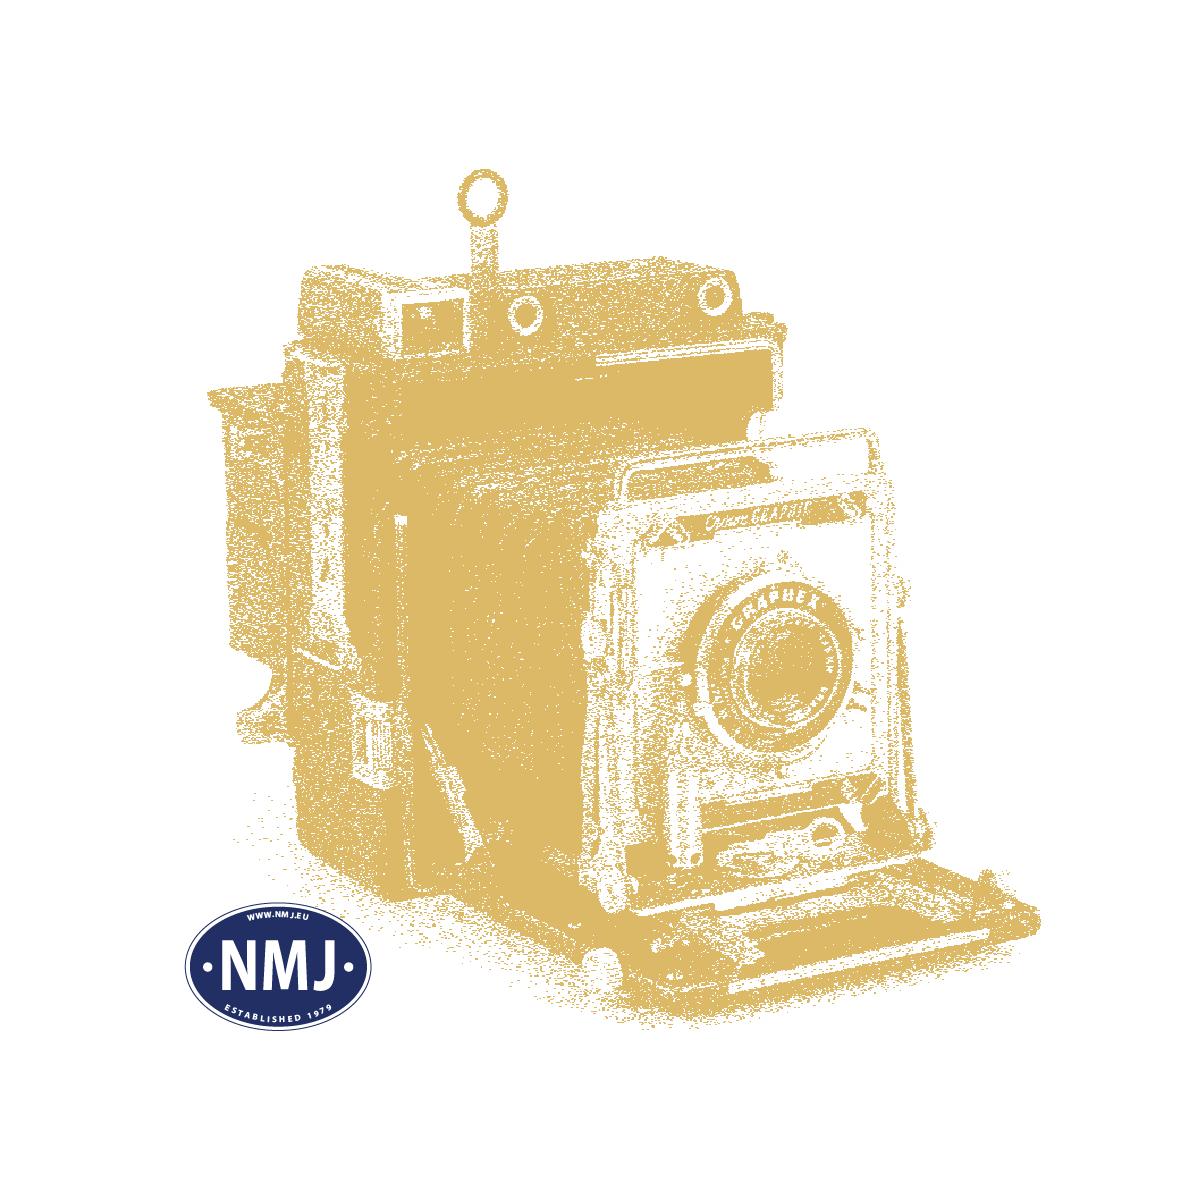 NOC08754 - Iskrystaller